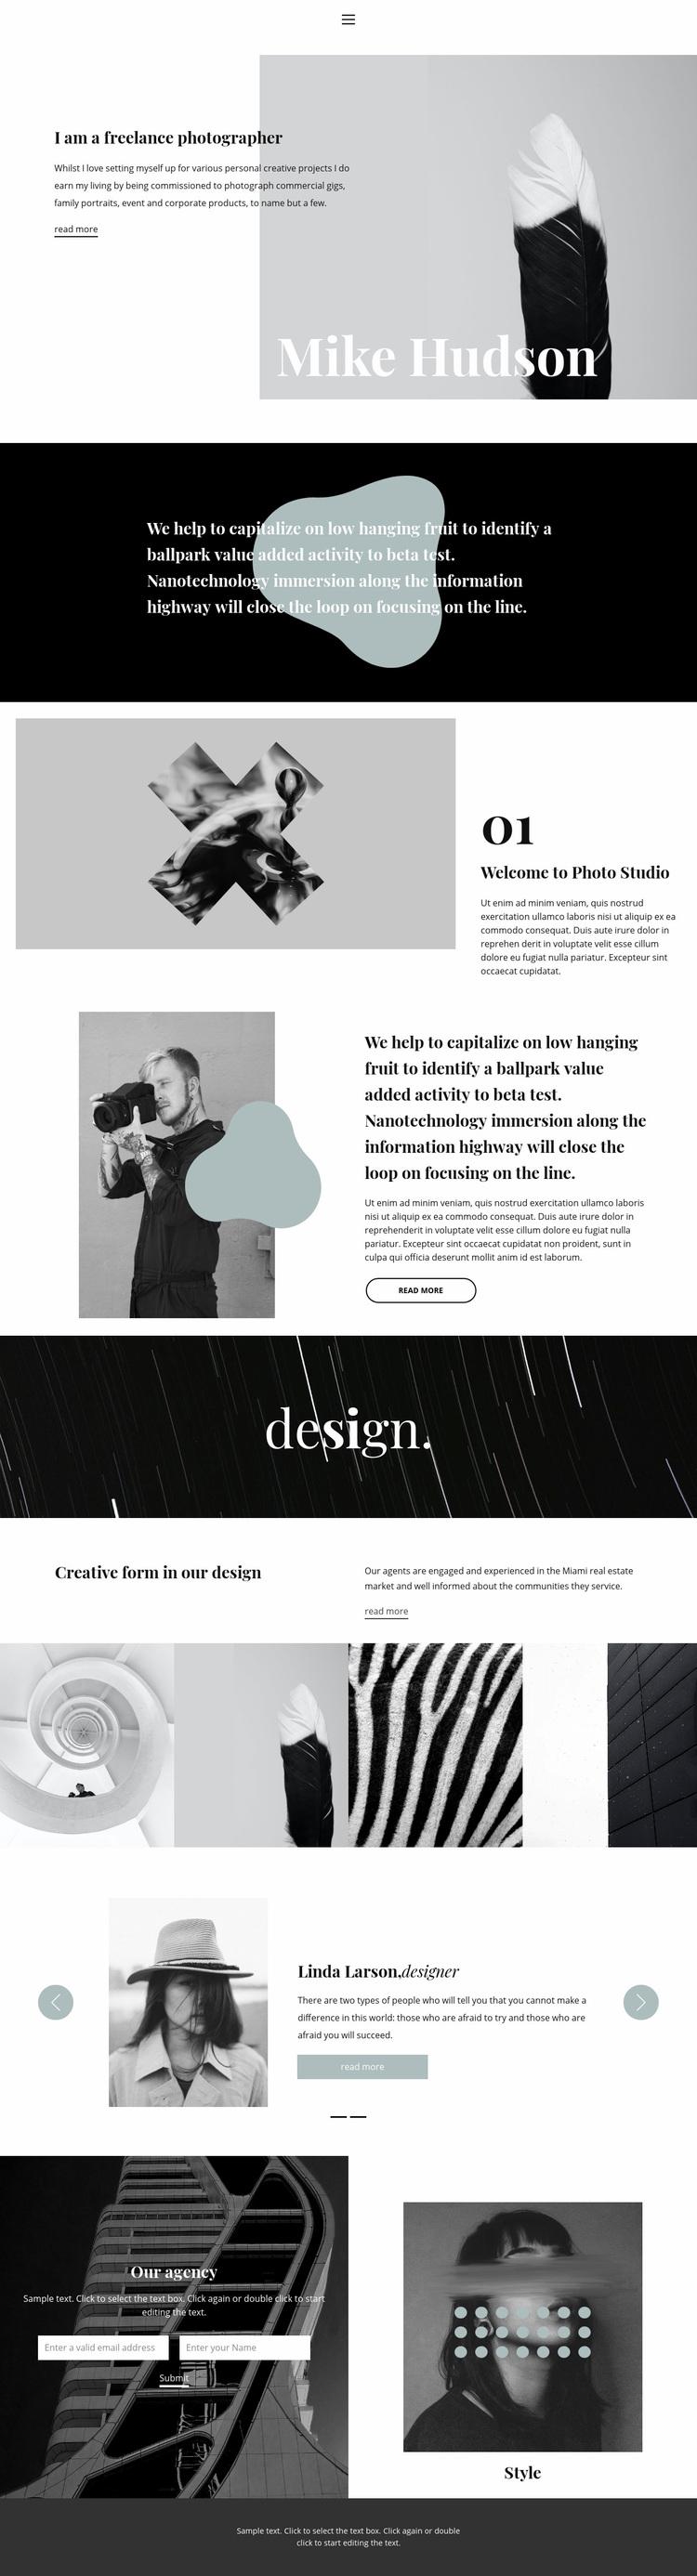 Professional photographer Web Page Designer